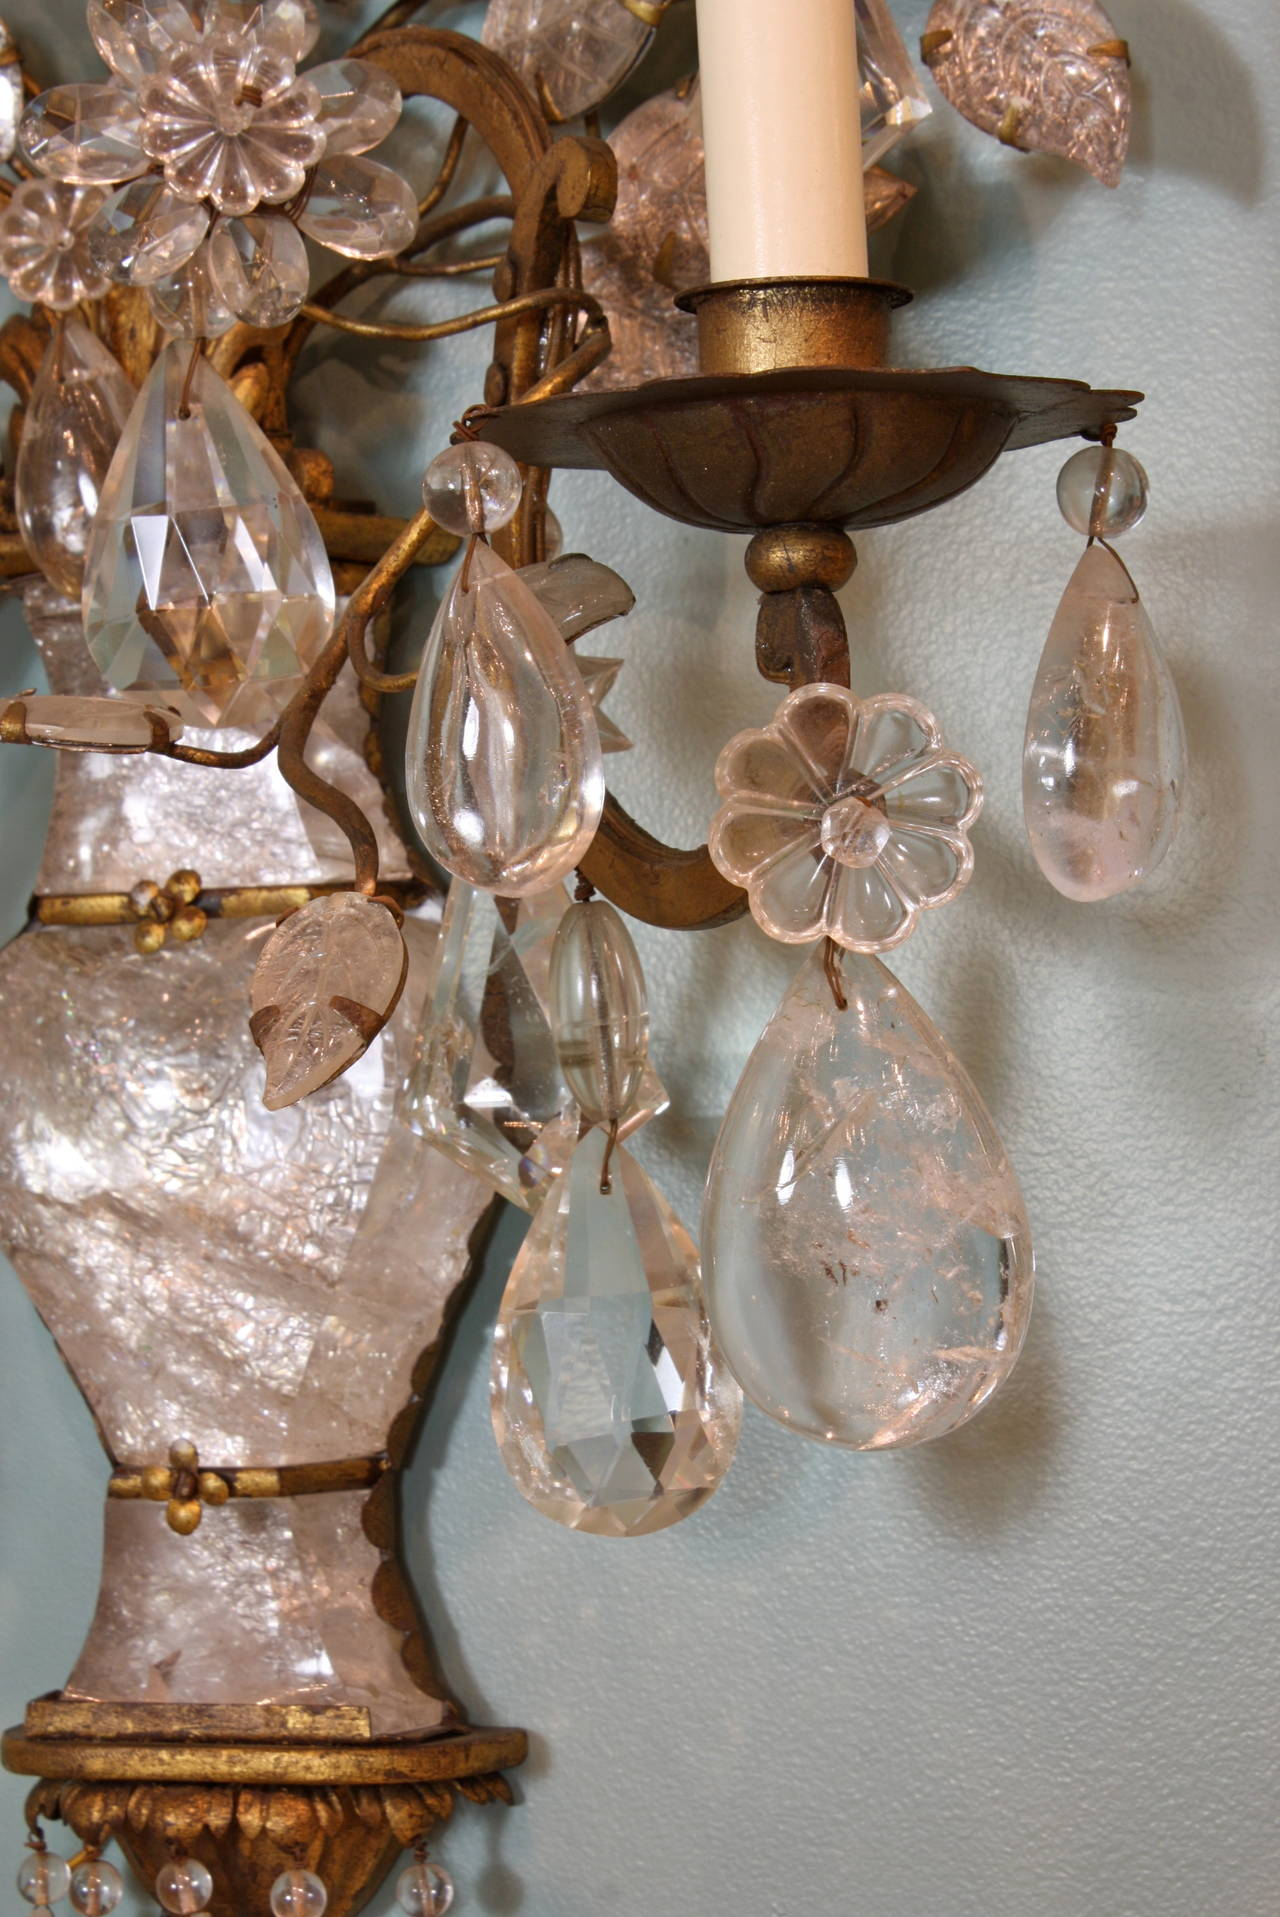 Glass Spectacular Pair of Maison Baguès Rock Crystal Sconces For Sale